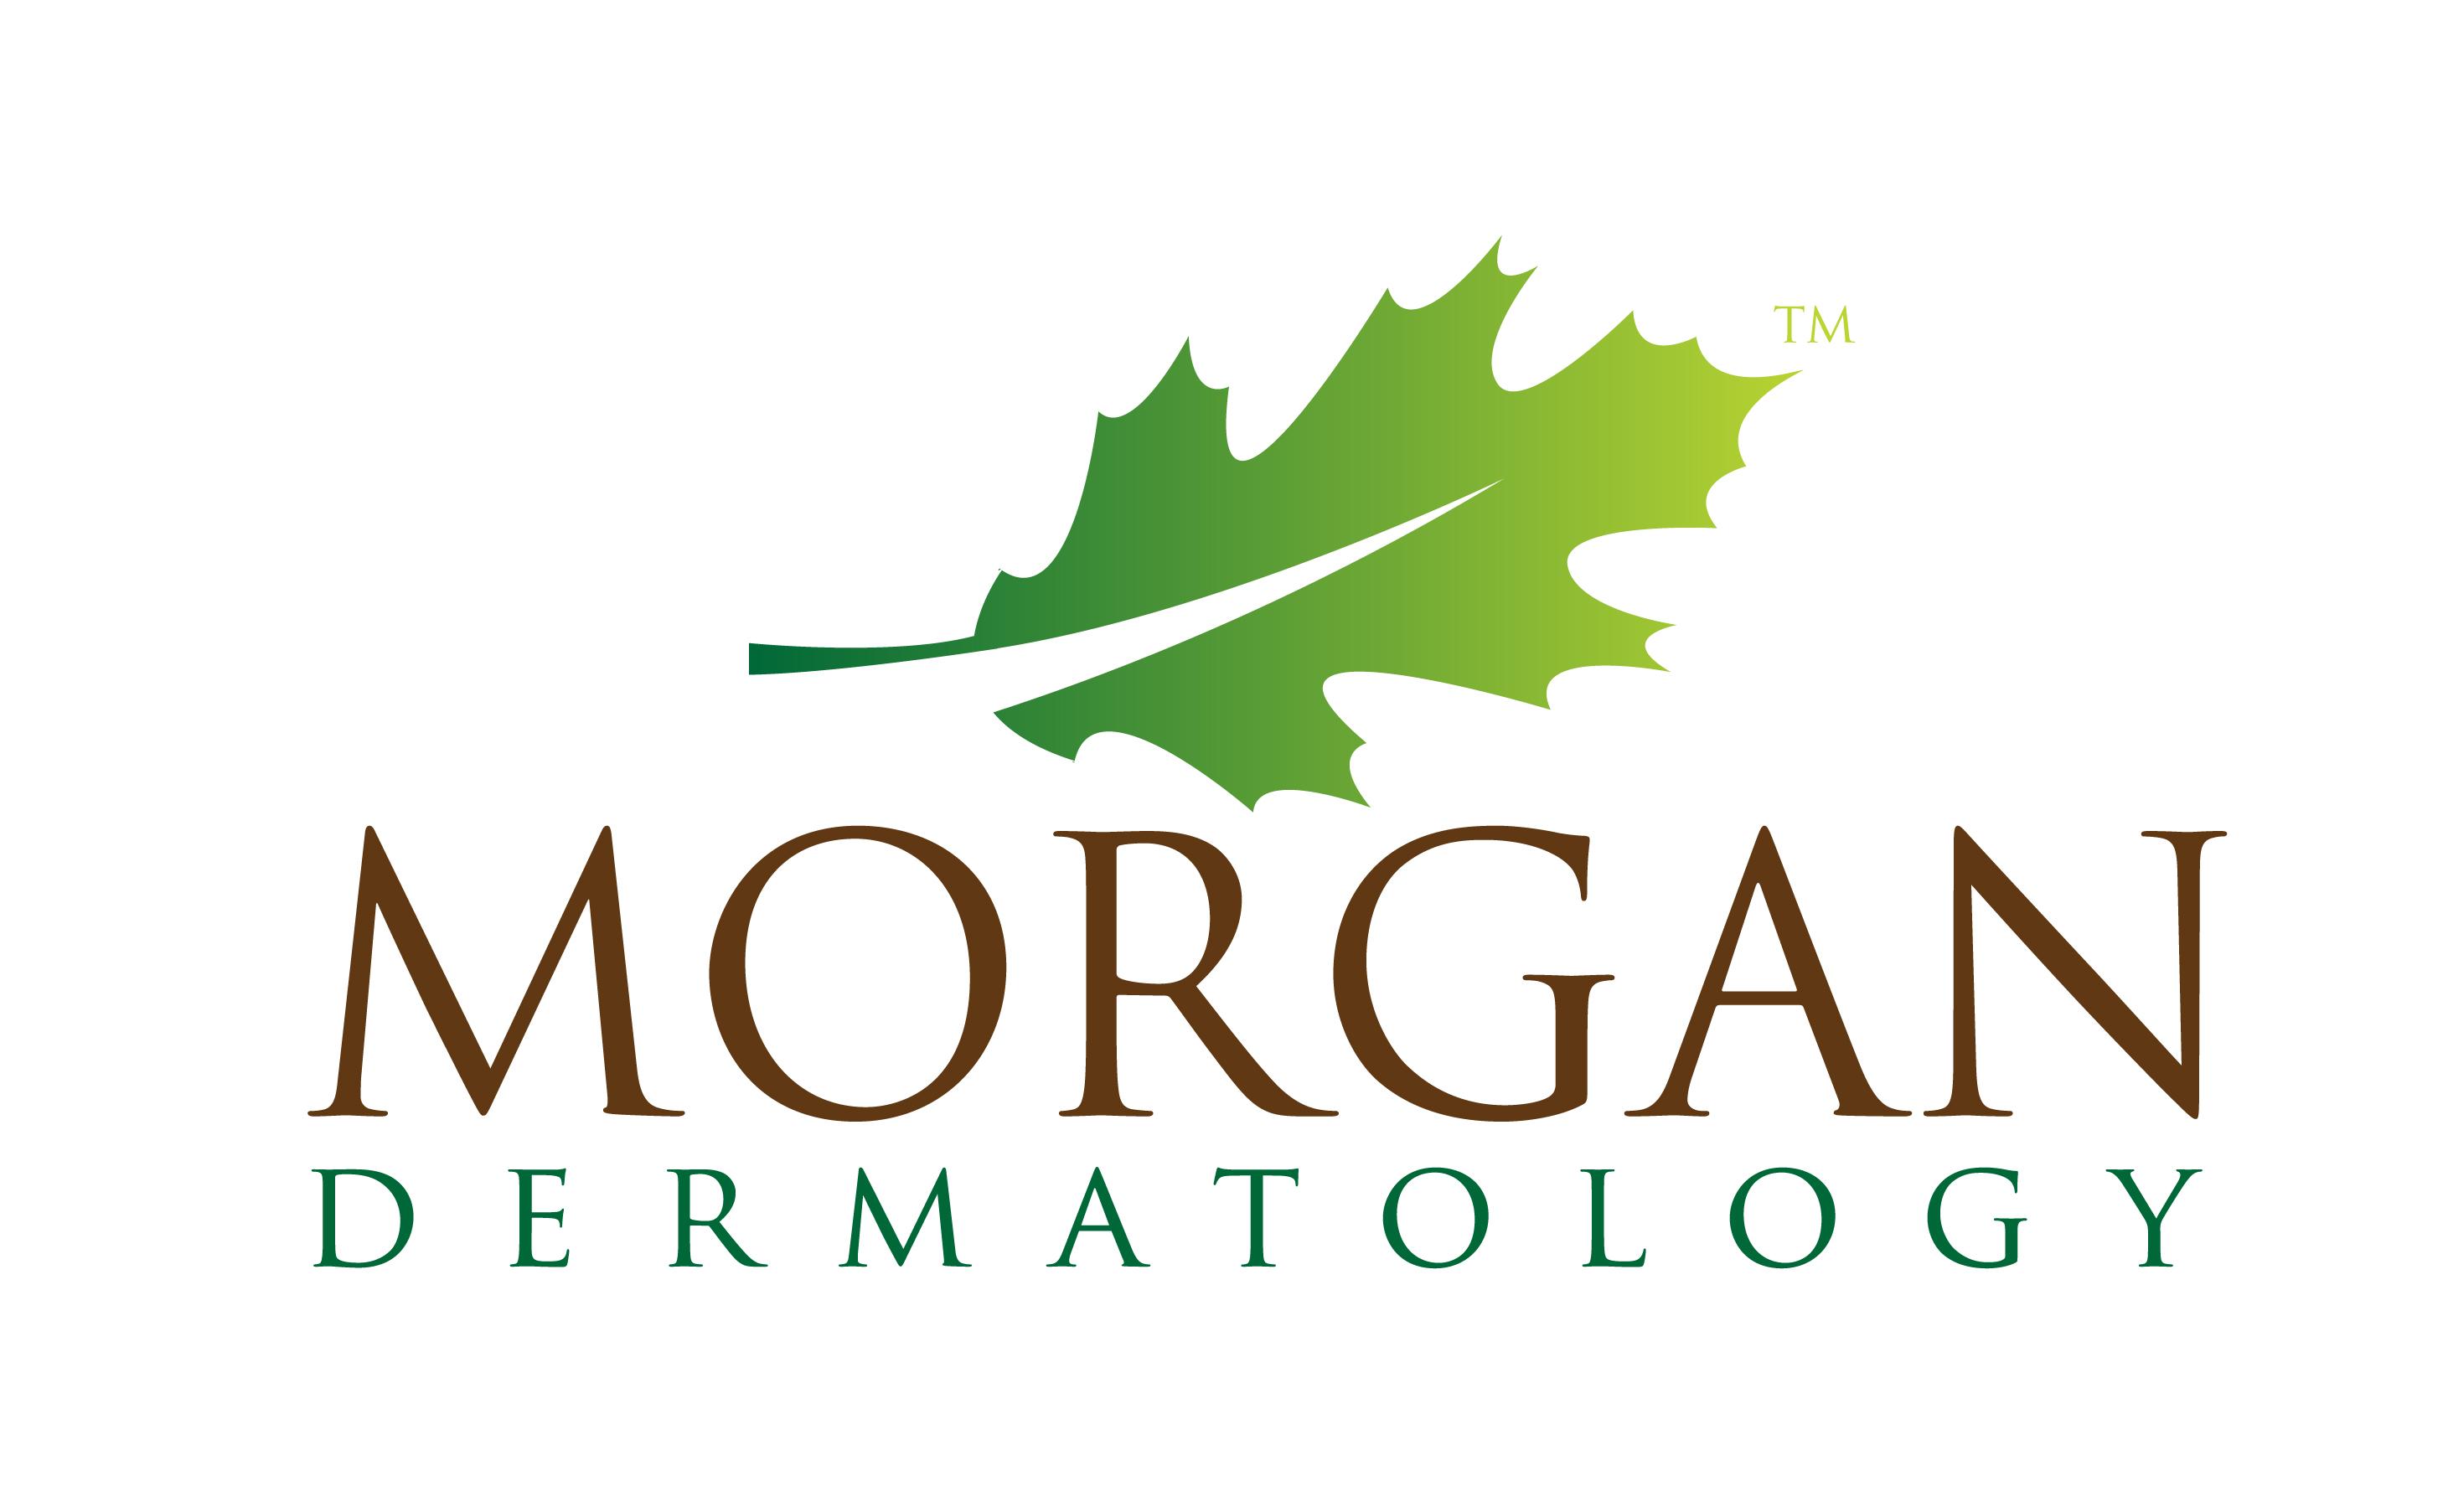 Morgan Dermatology